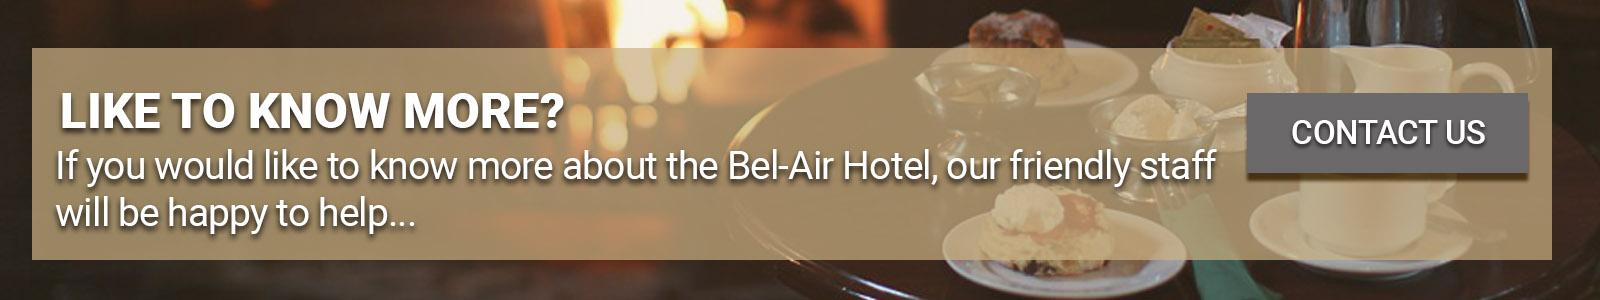 Eating at Bel-Air Hotel